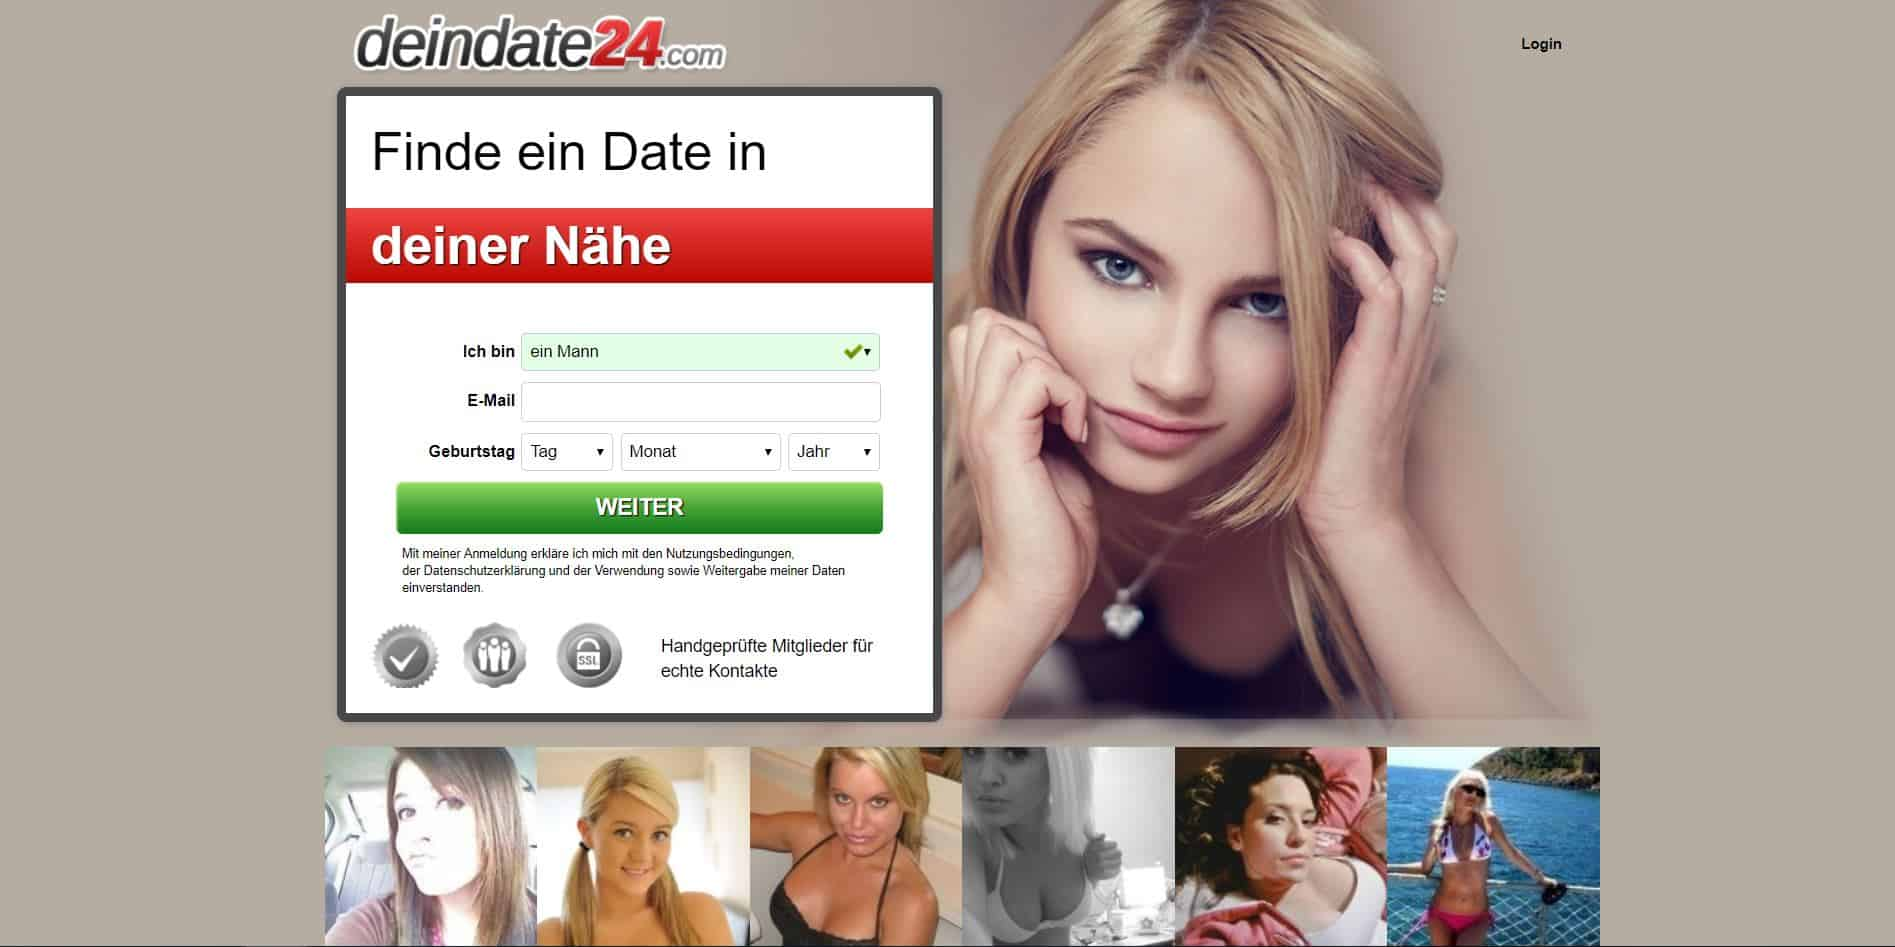 Testbericht: DeinDate24.com